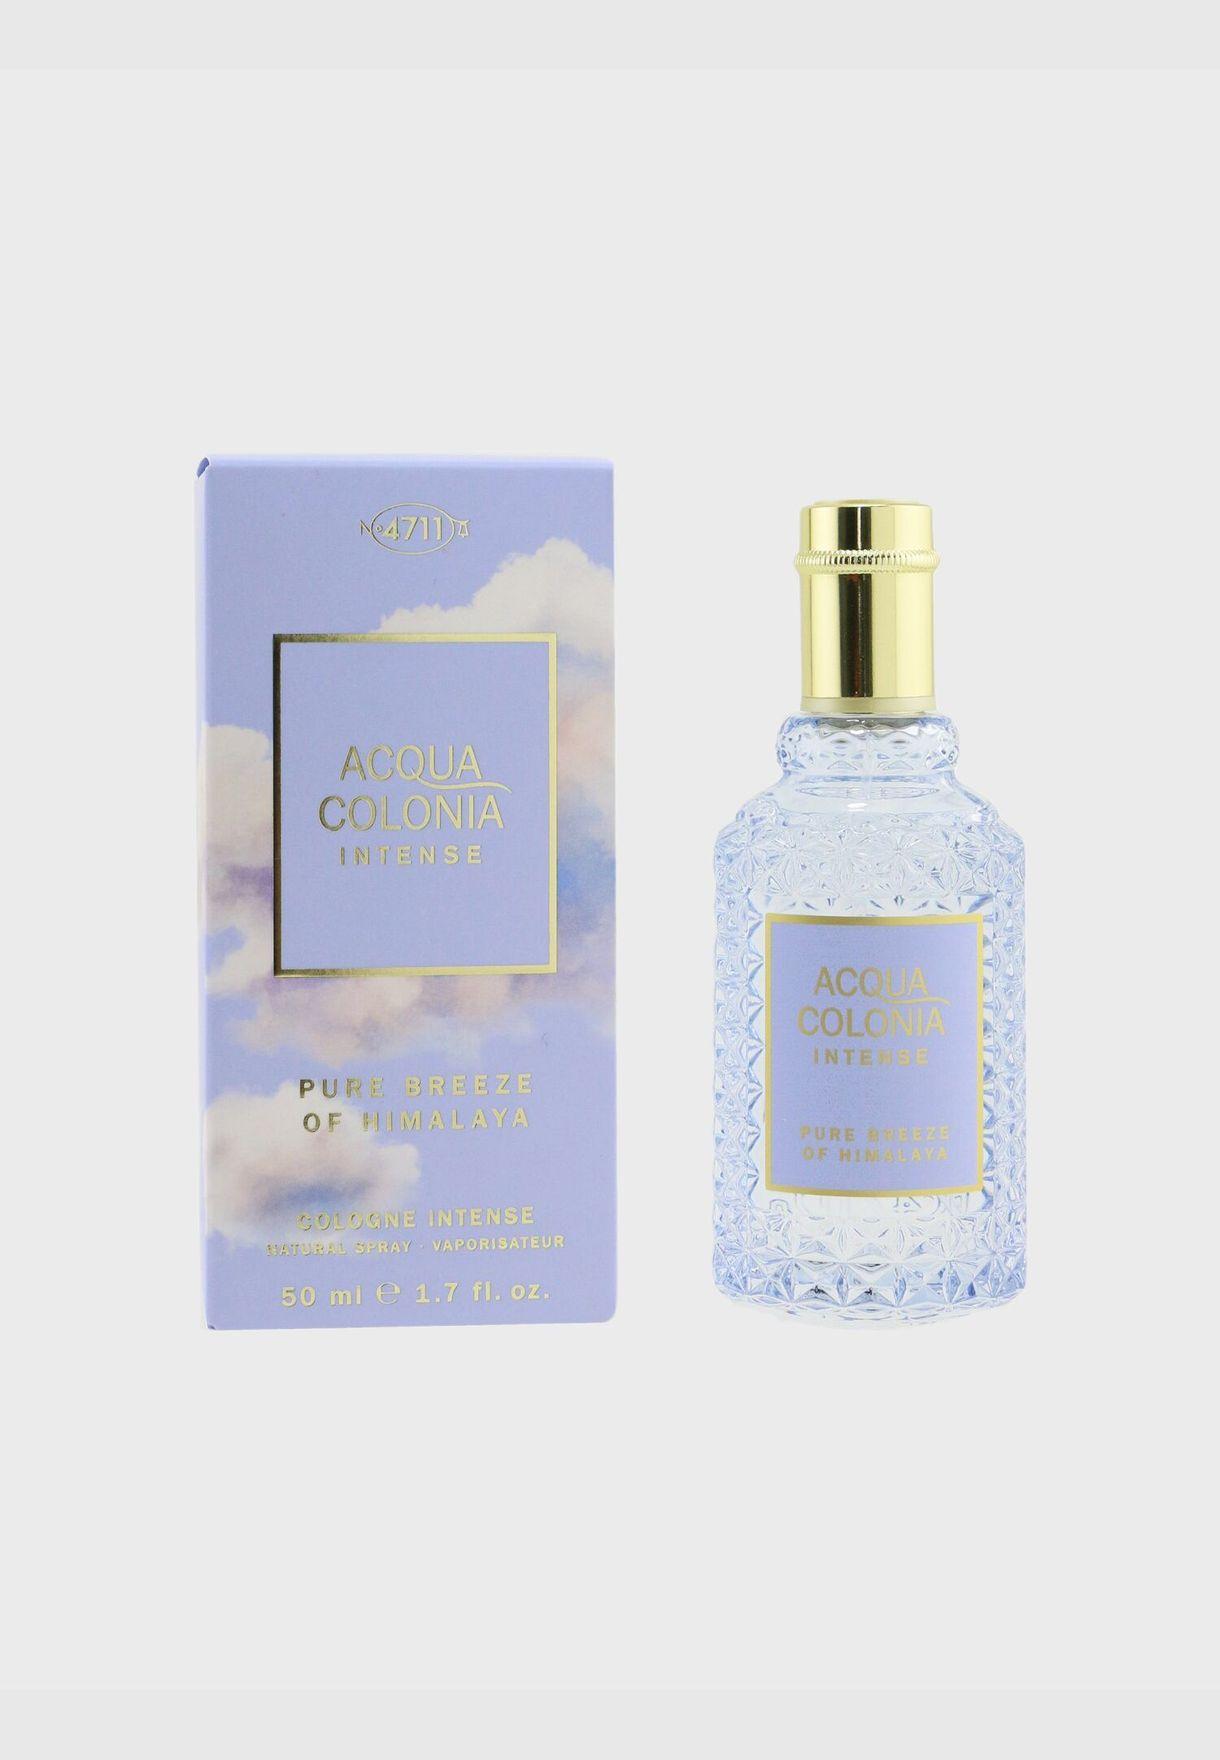 Acqua Colonia Intense Pure Breeze Of Himalaya Eau De Cologne Spray